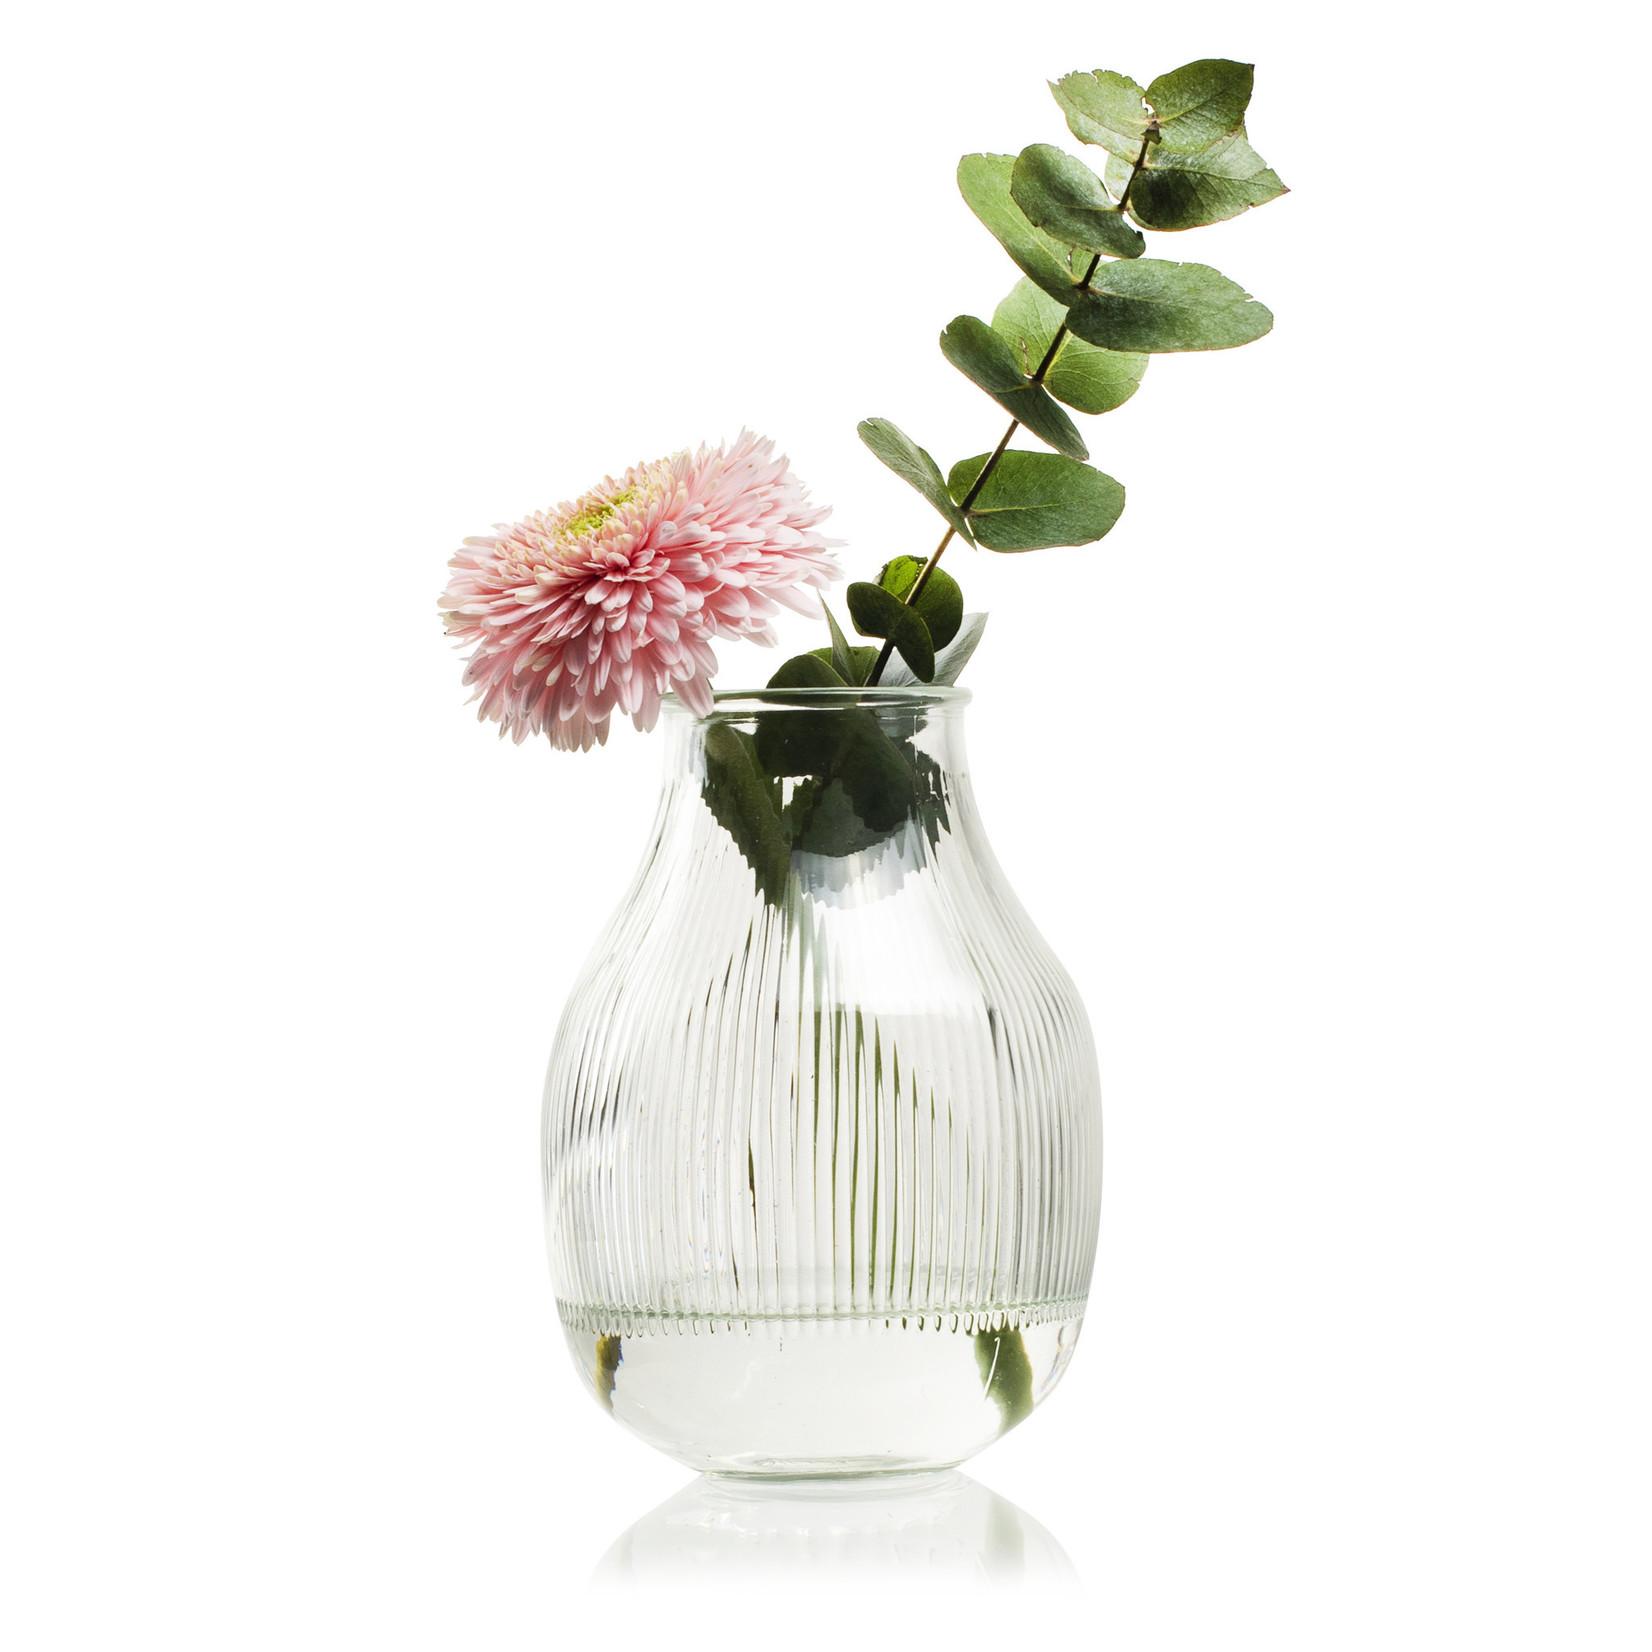 Jodeco Glass Design vaas met ribbel 'Dean' H17,5 D12,5/7 cm Transparant